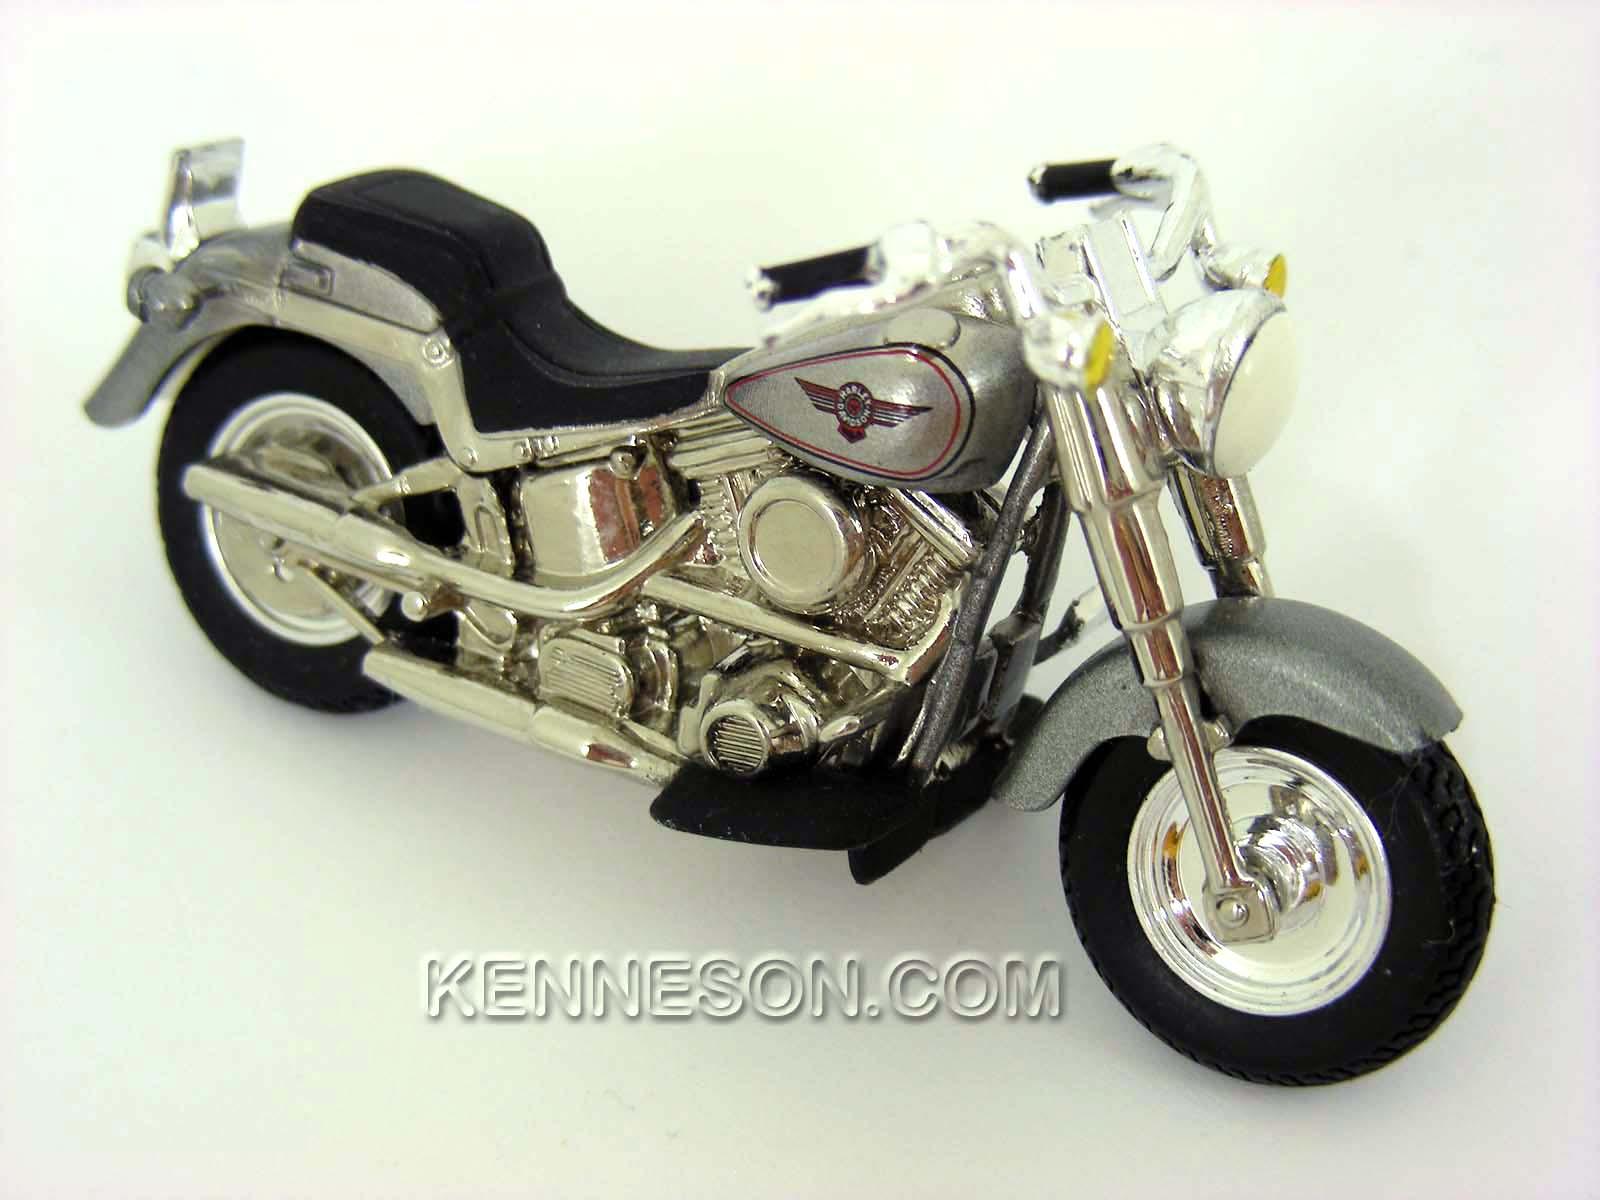 harley-davidson '90s fatboy hot wheels motorcycle | ebay